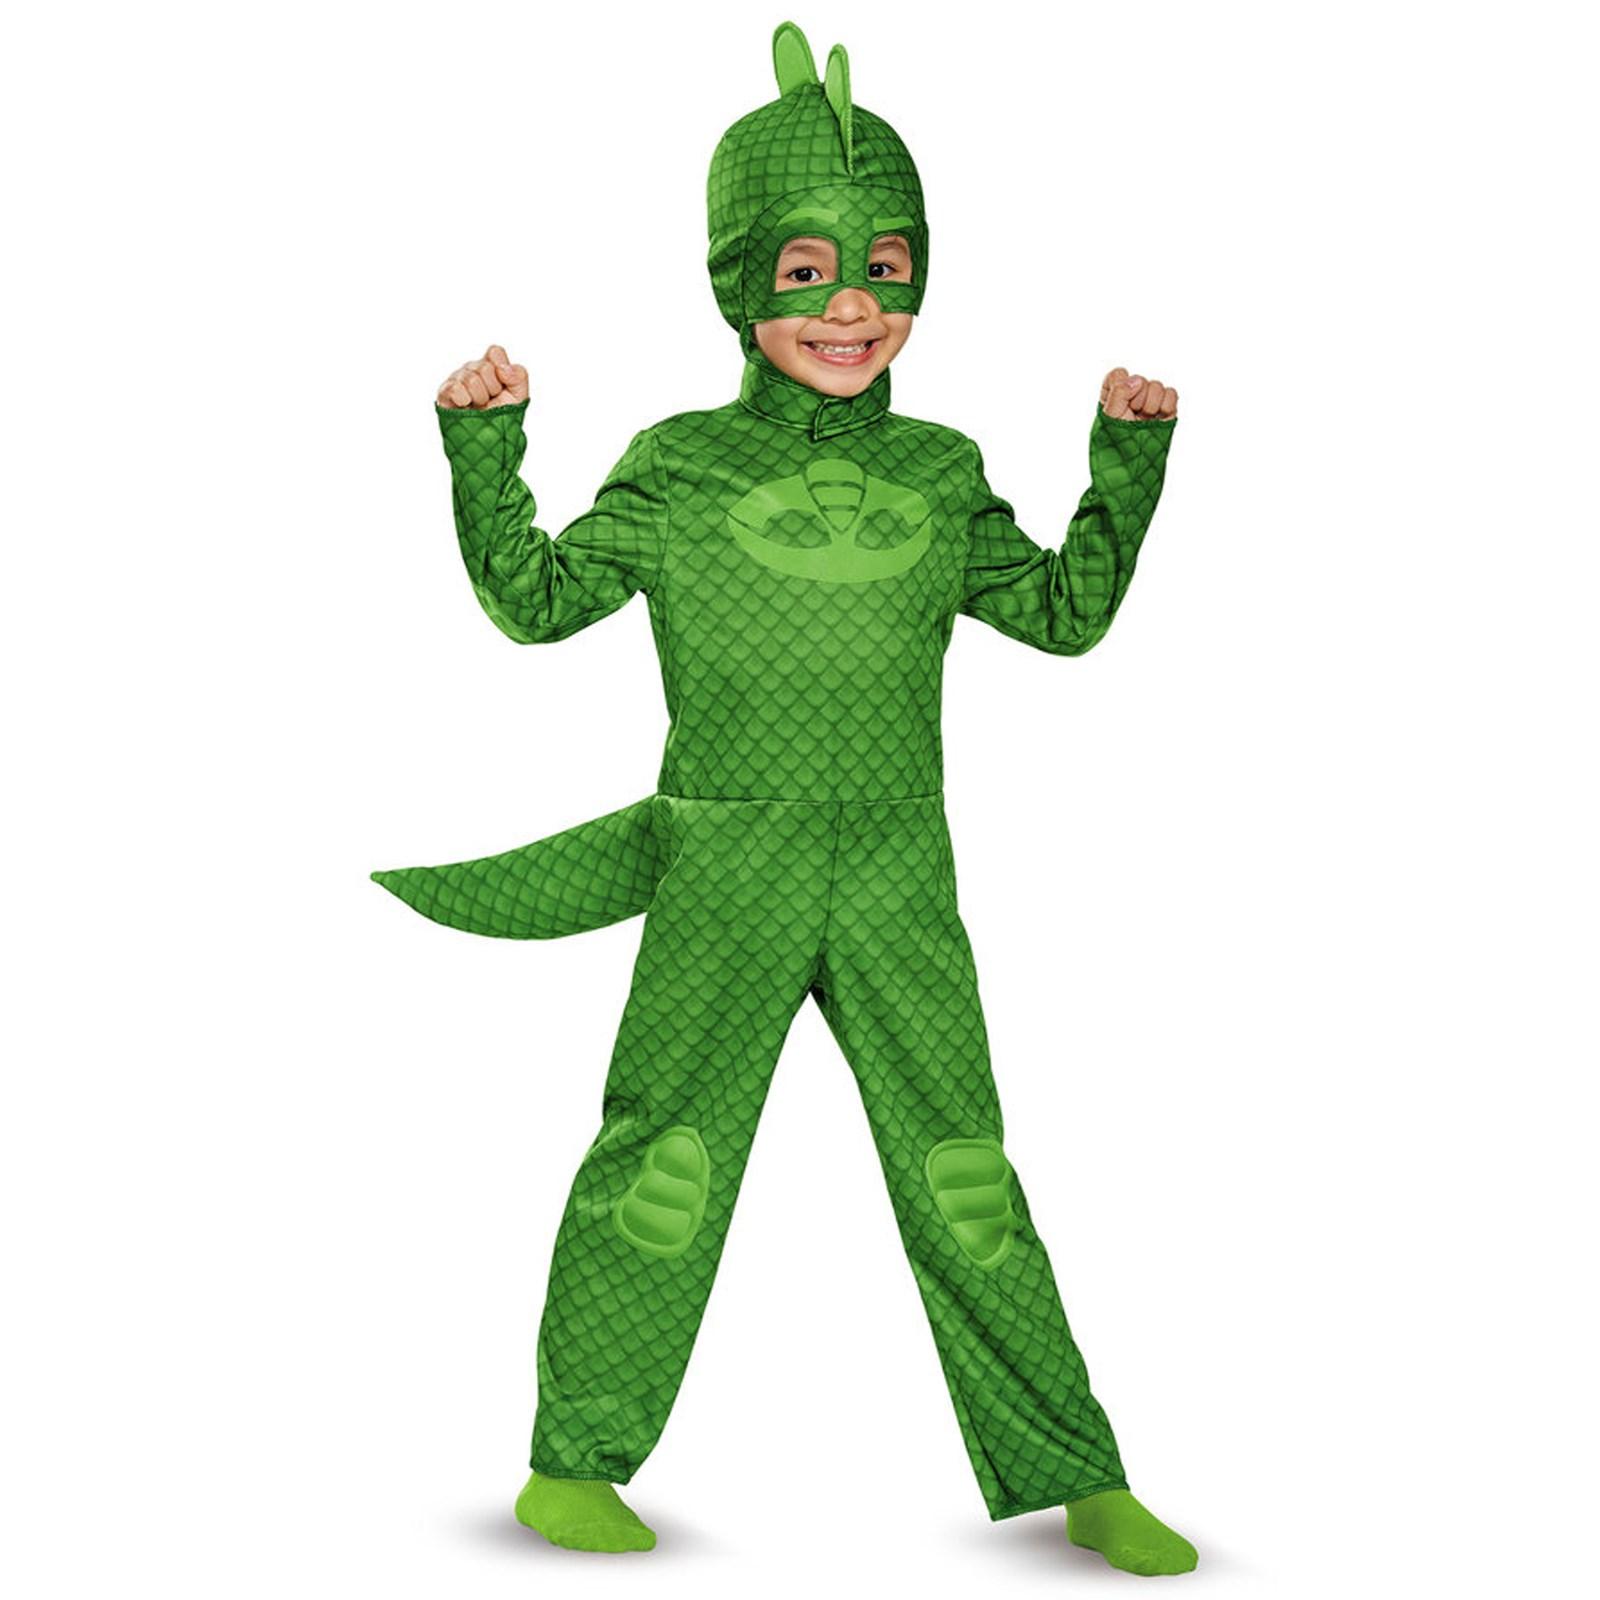 Delightful PJ Masks Gekko Classic Costume For Toddler